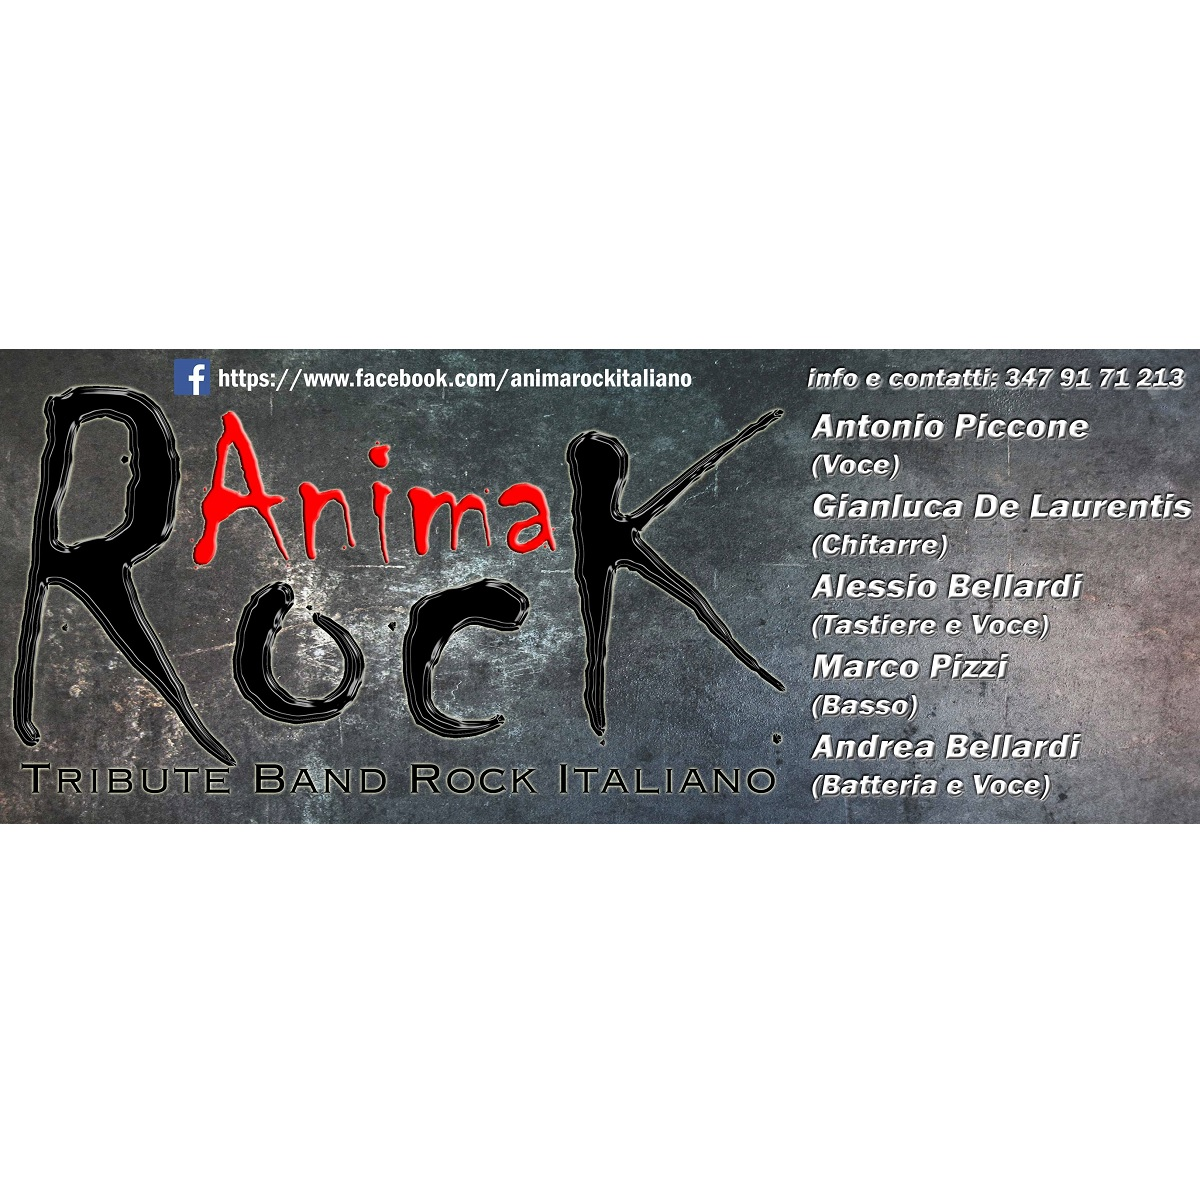 Anima Rock live Fara San Martino sabato 3 luglio 2021 foto